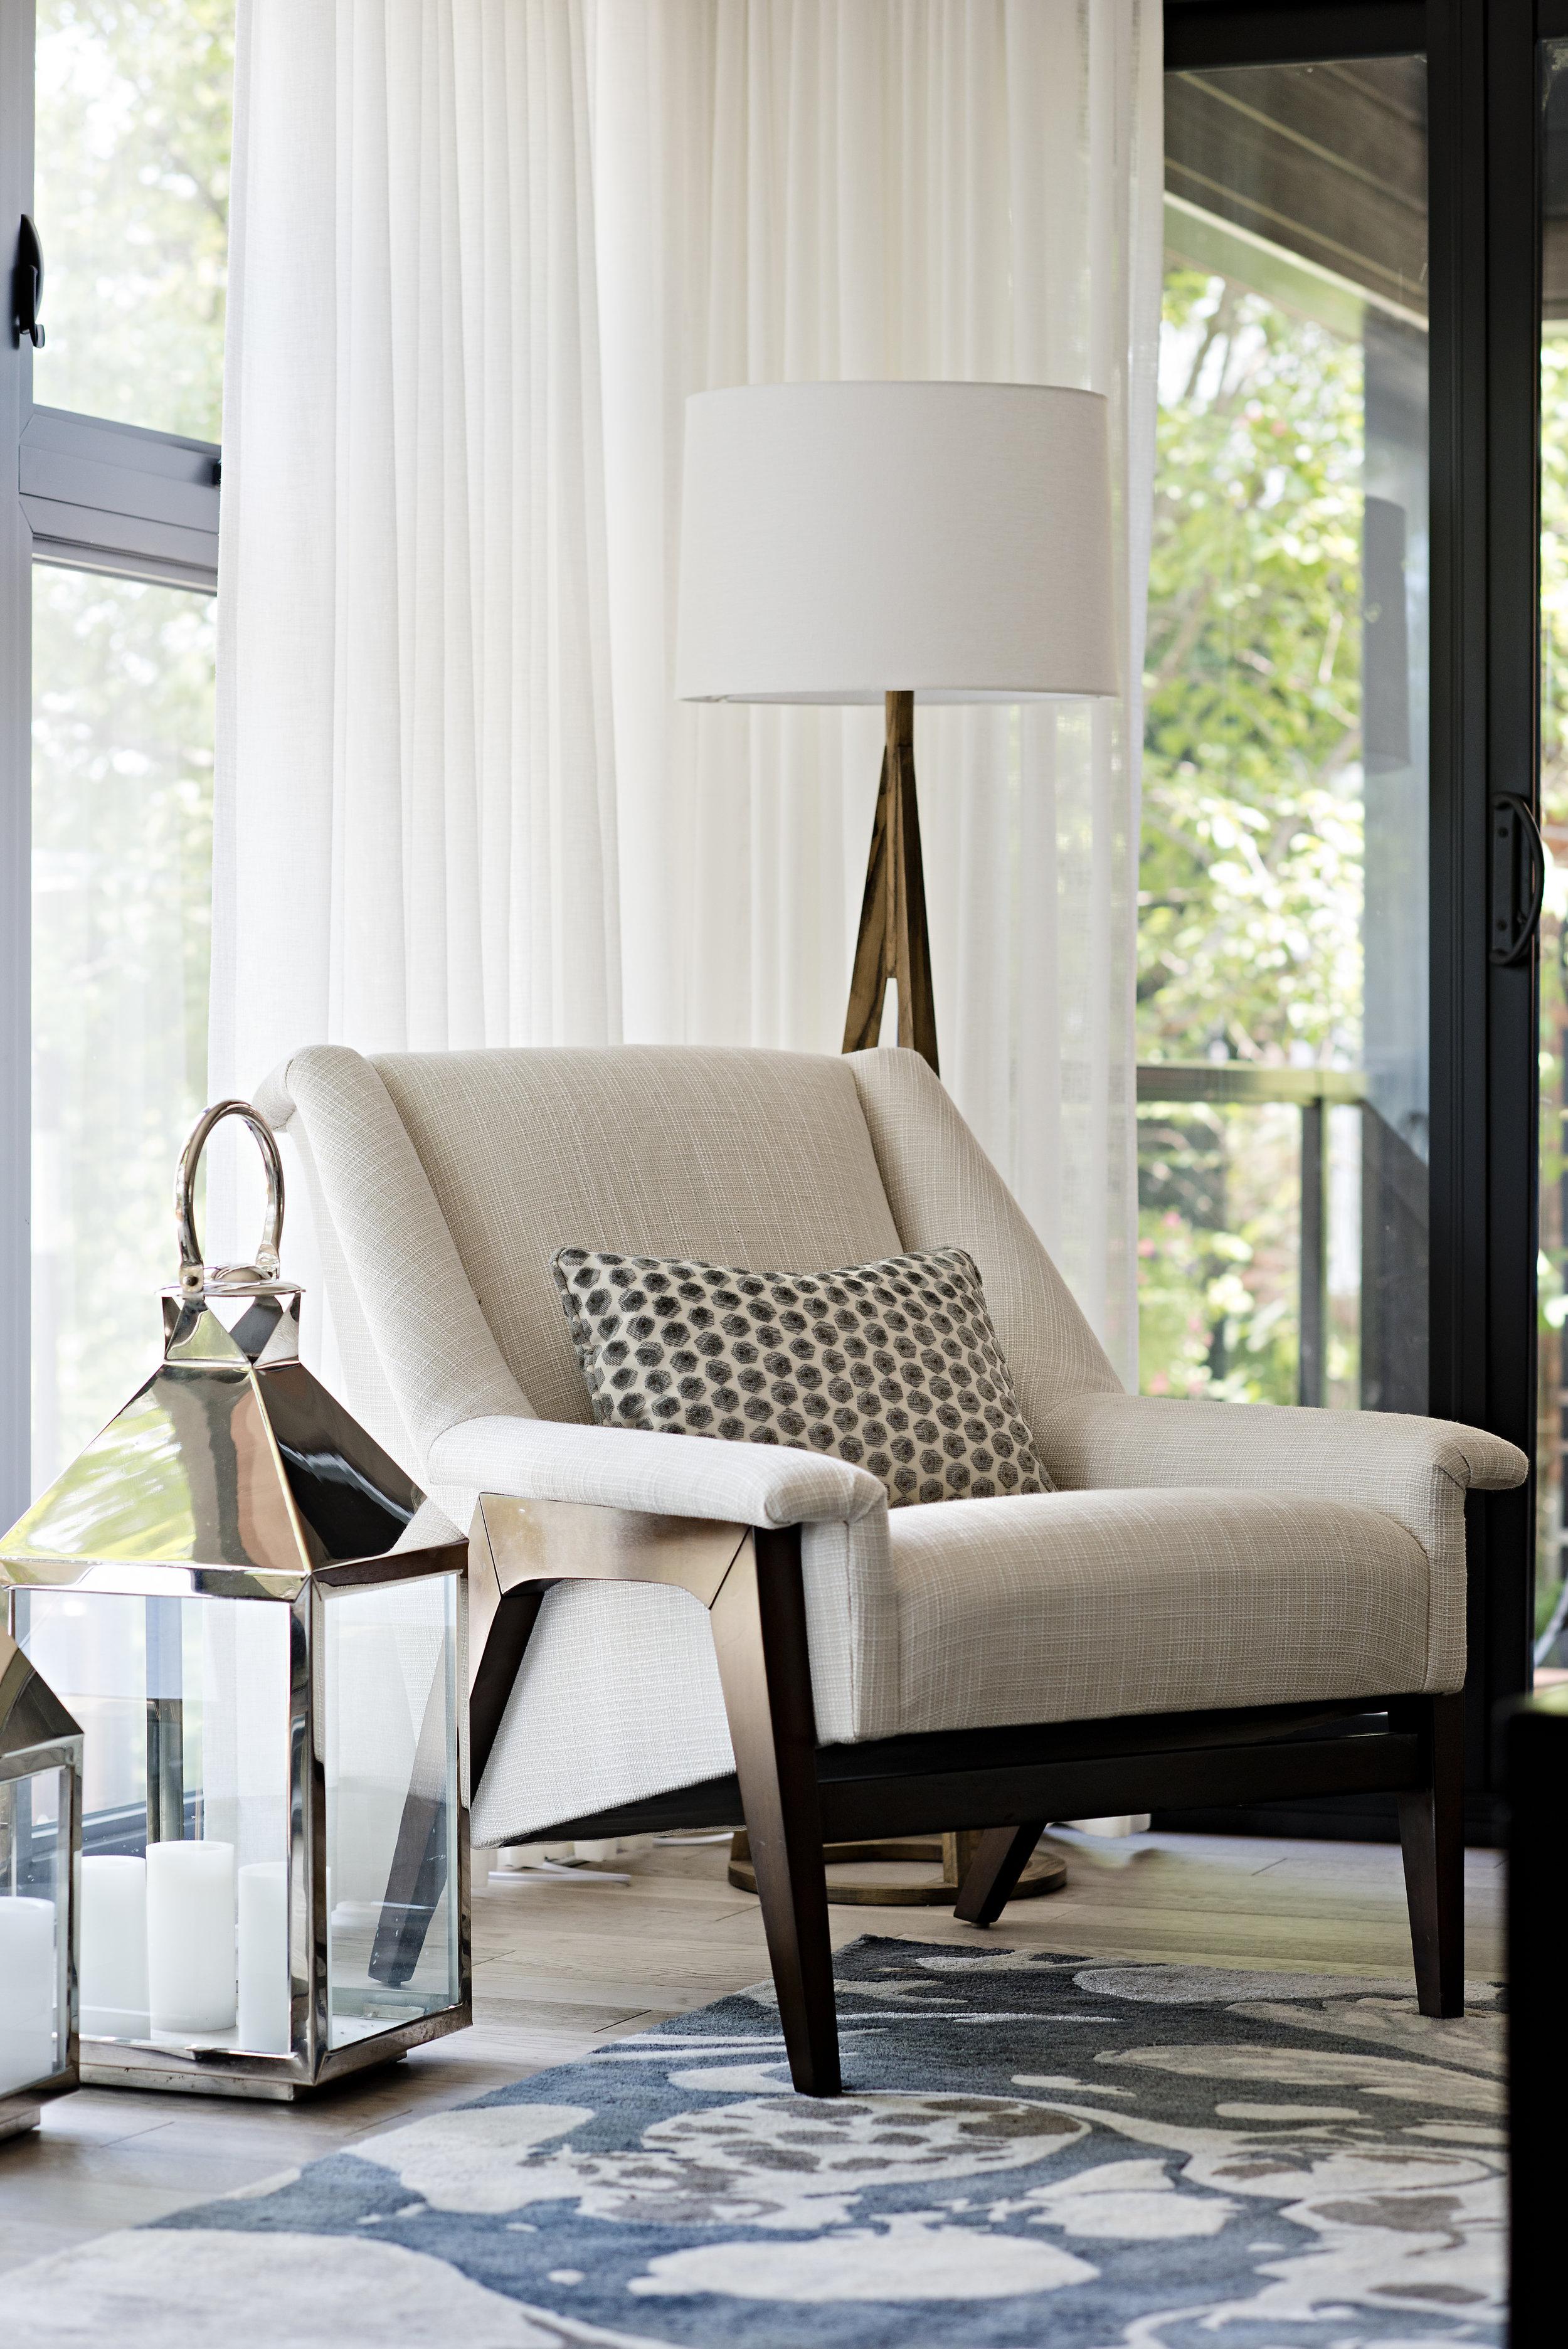 Family Room Chair 2.jpg